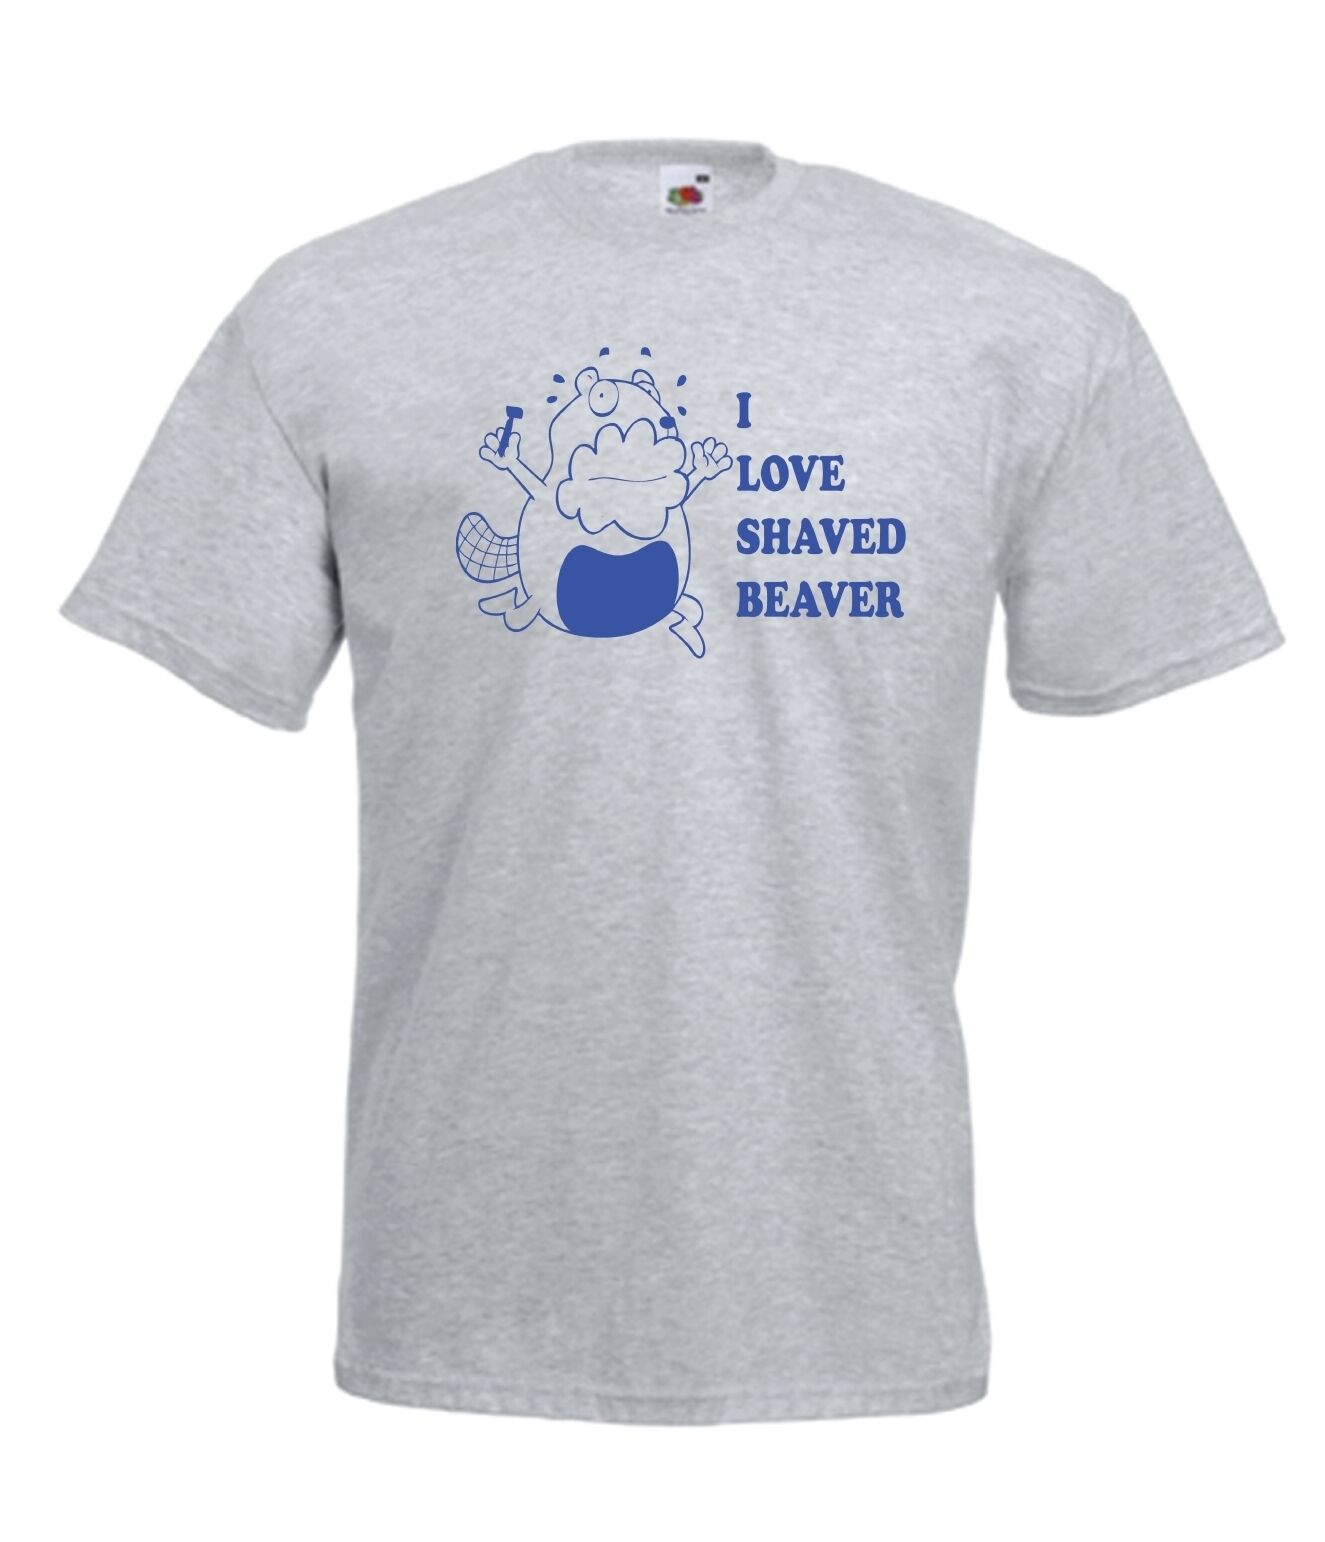 I LOVE BEAVER funny rude xmas birthday gift idea mens womens adult T SHIRT TOPFashion Style Men T Shirts 100% Cotton Classic